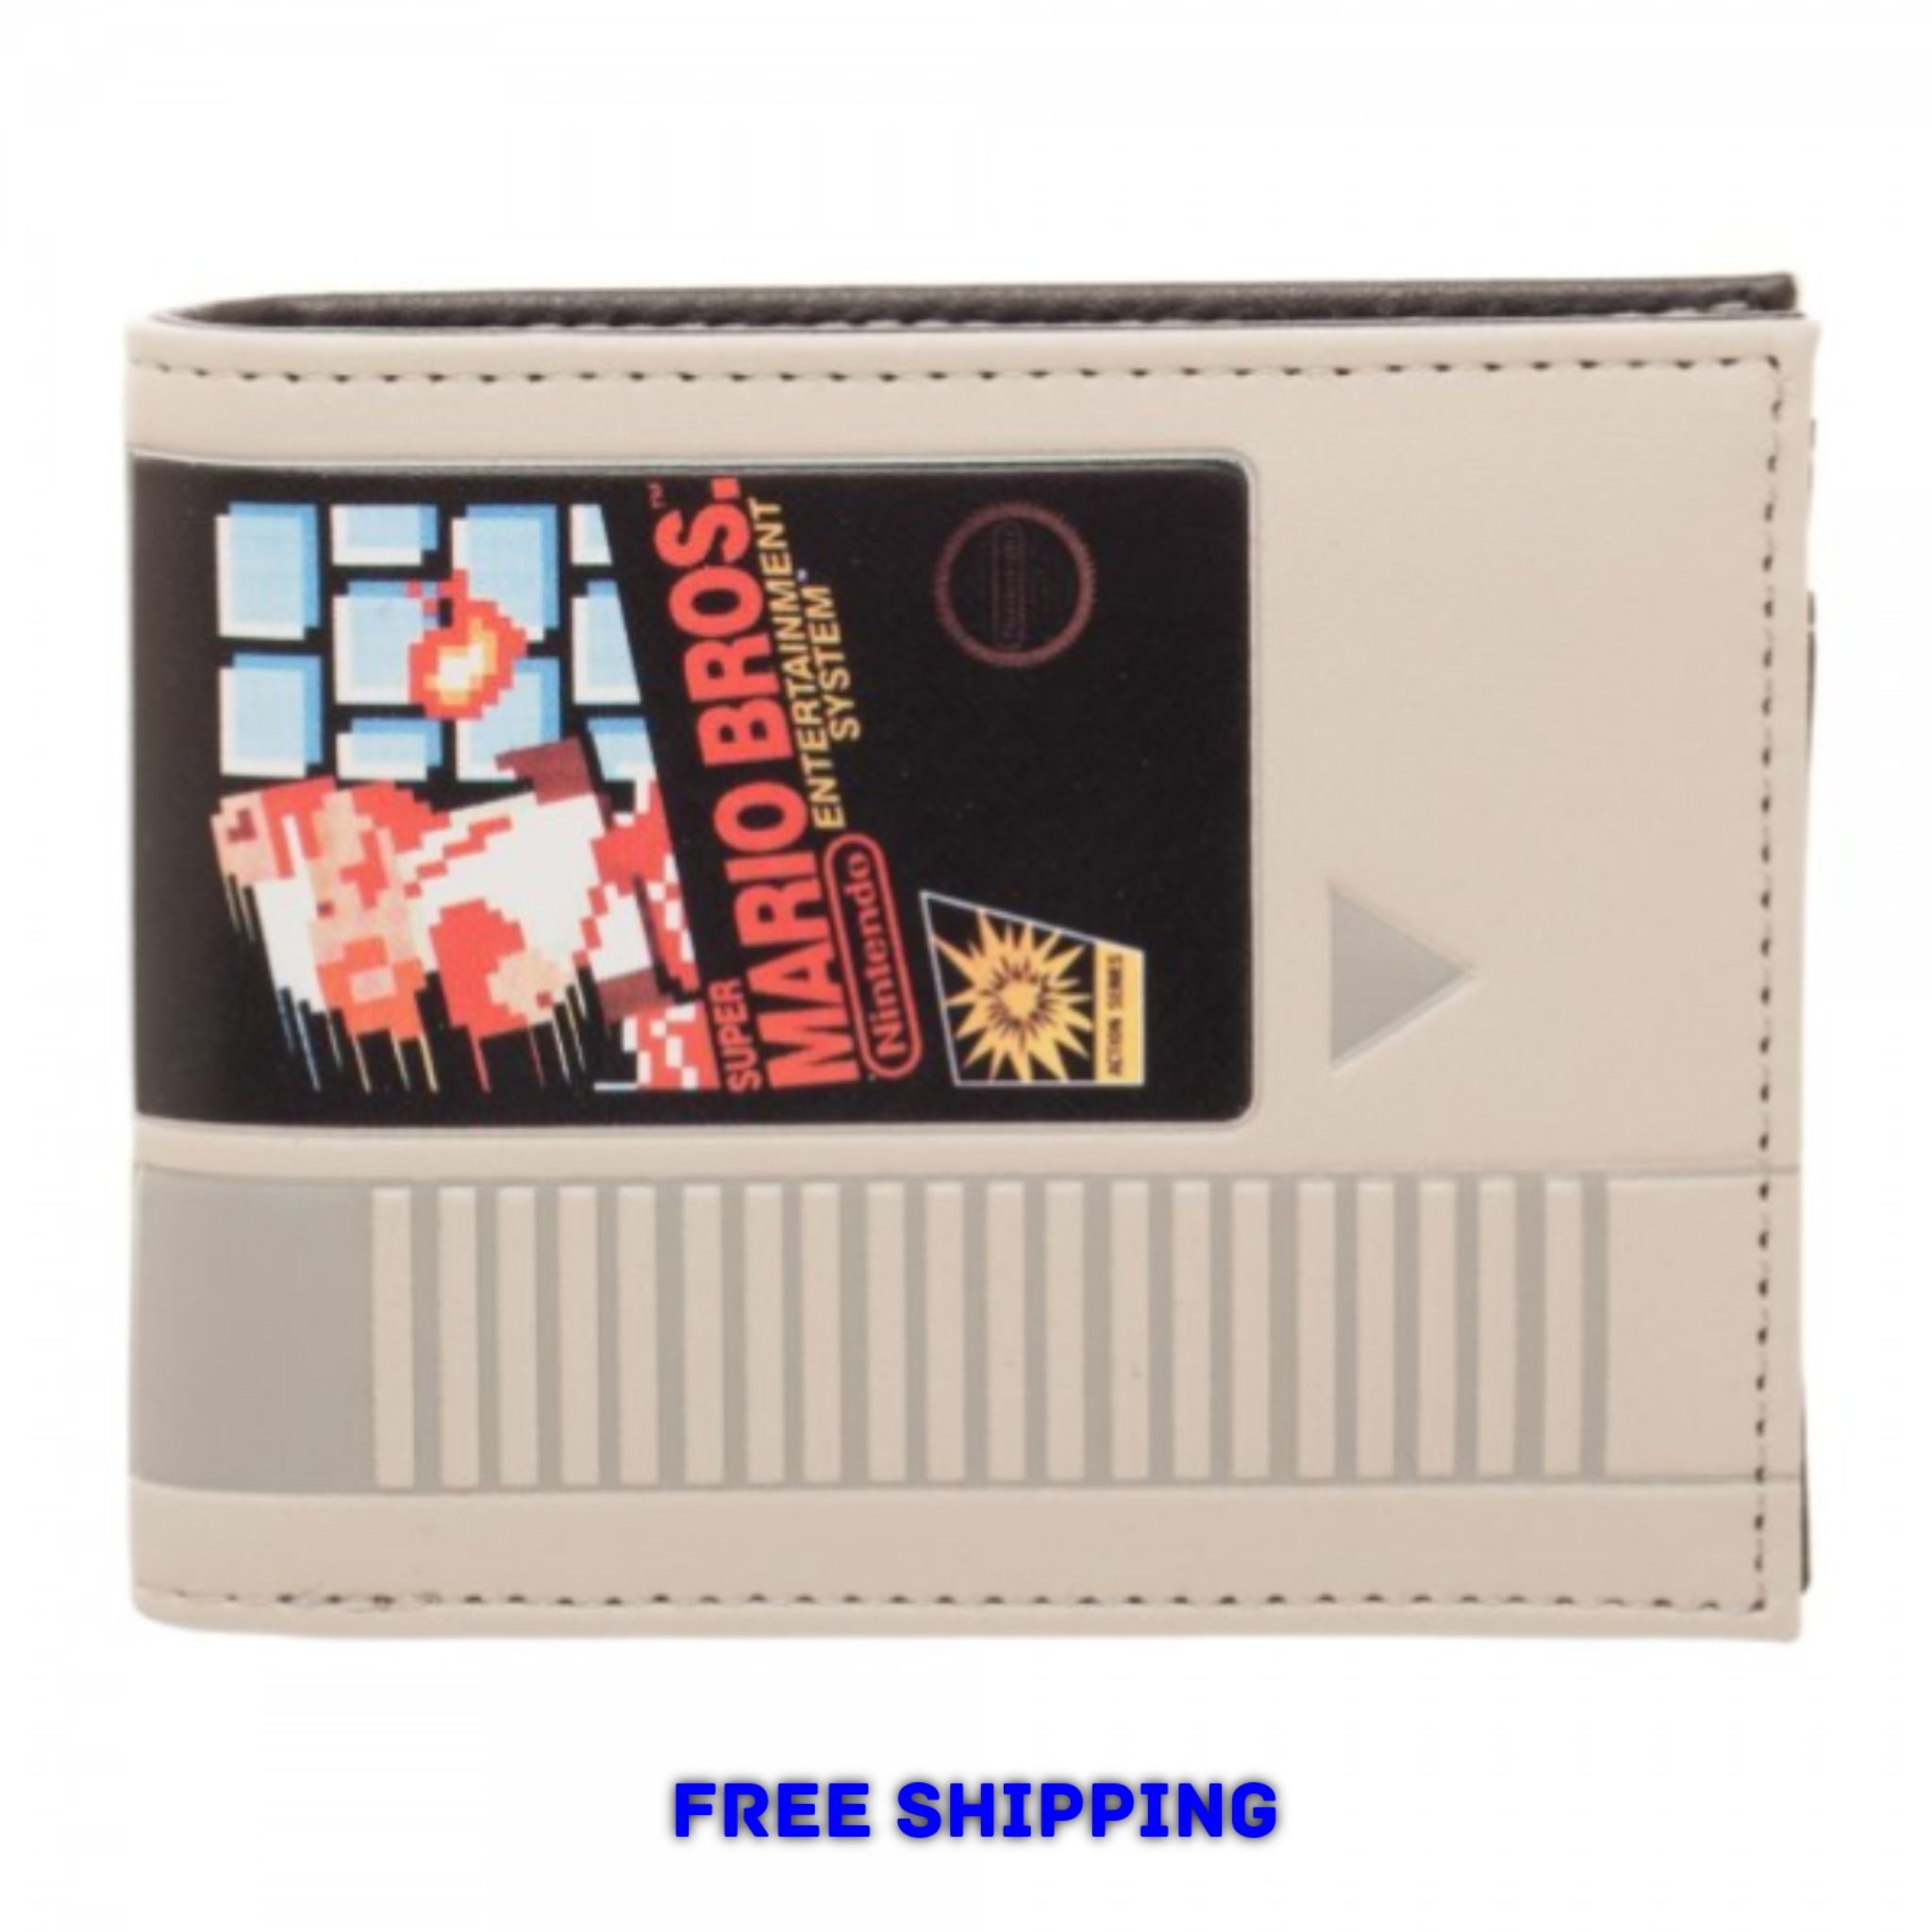 Nintendo Classic Nes Super Mario Bros Cartridge Bi Fold Wallet Retro New Super Mario Super Mario Bros Nintendo Classic